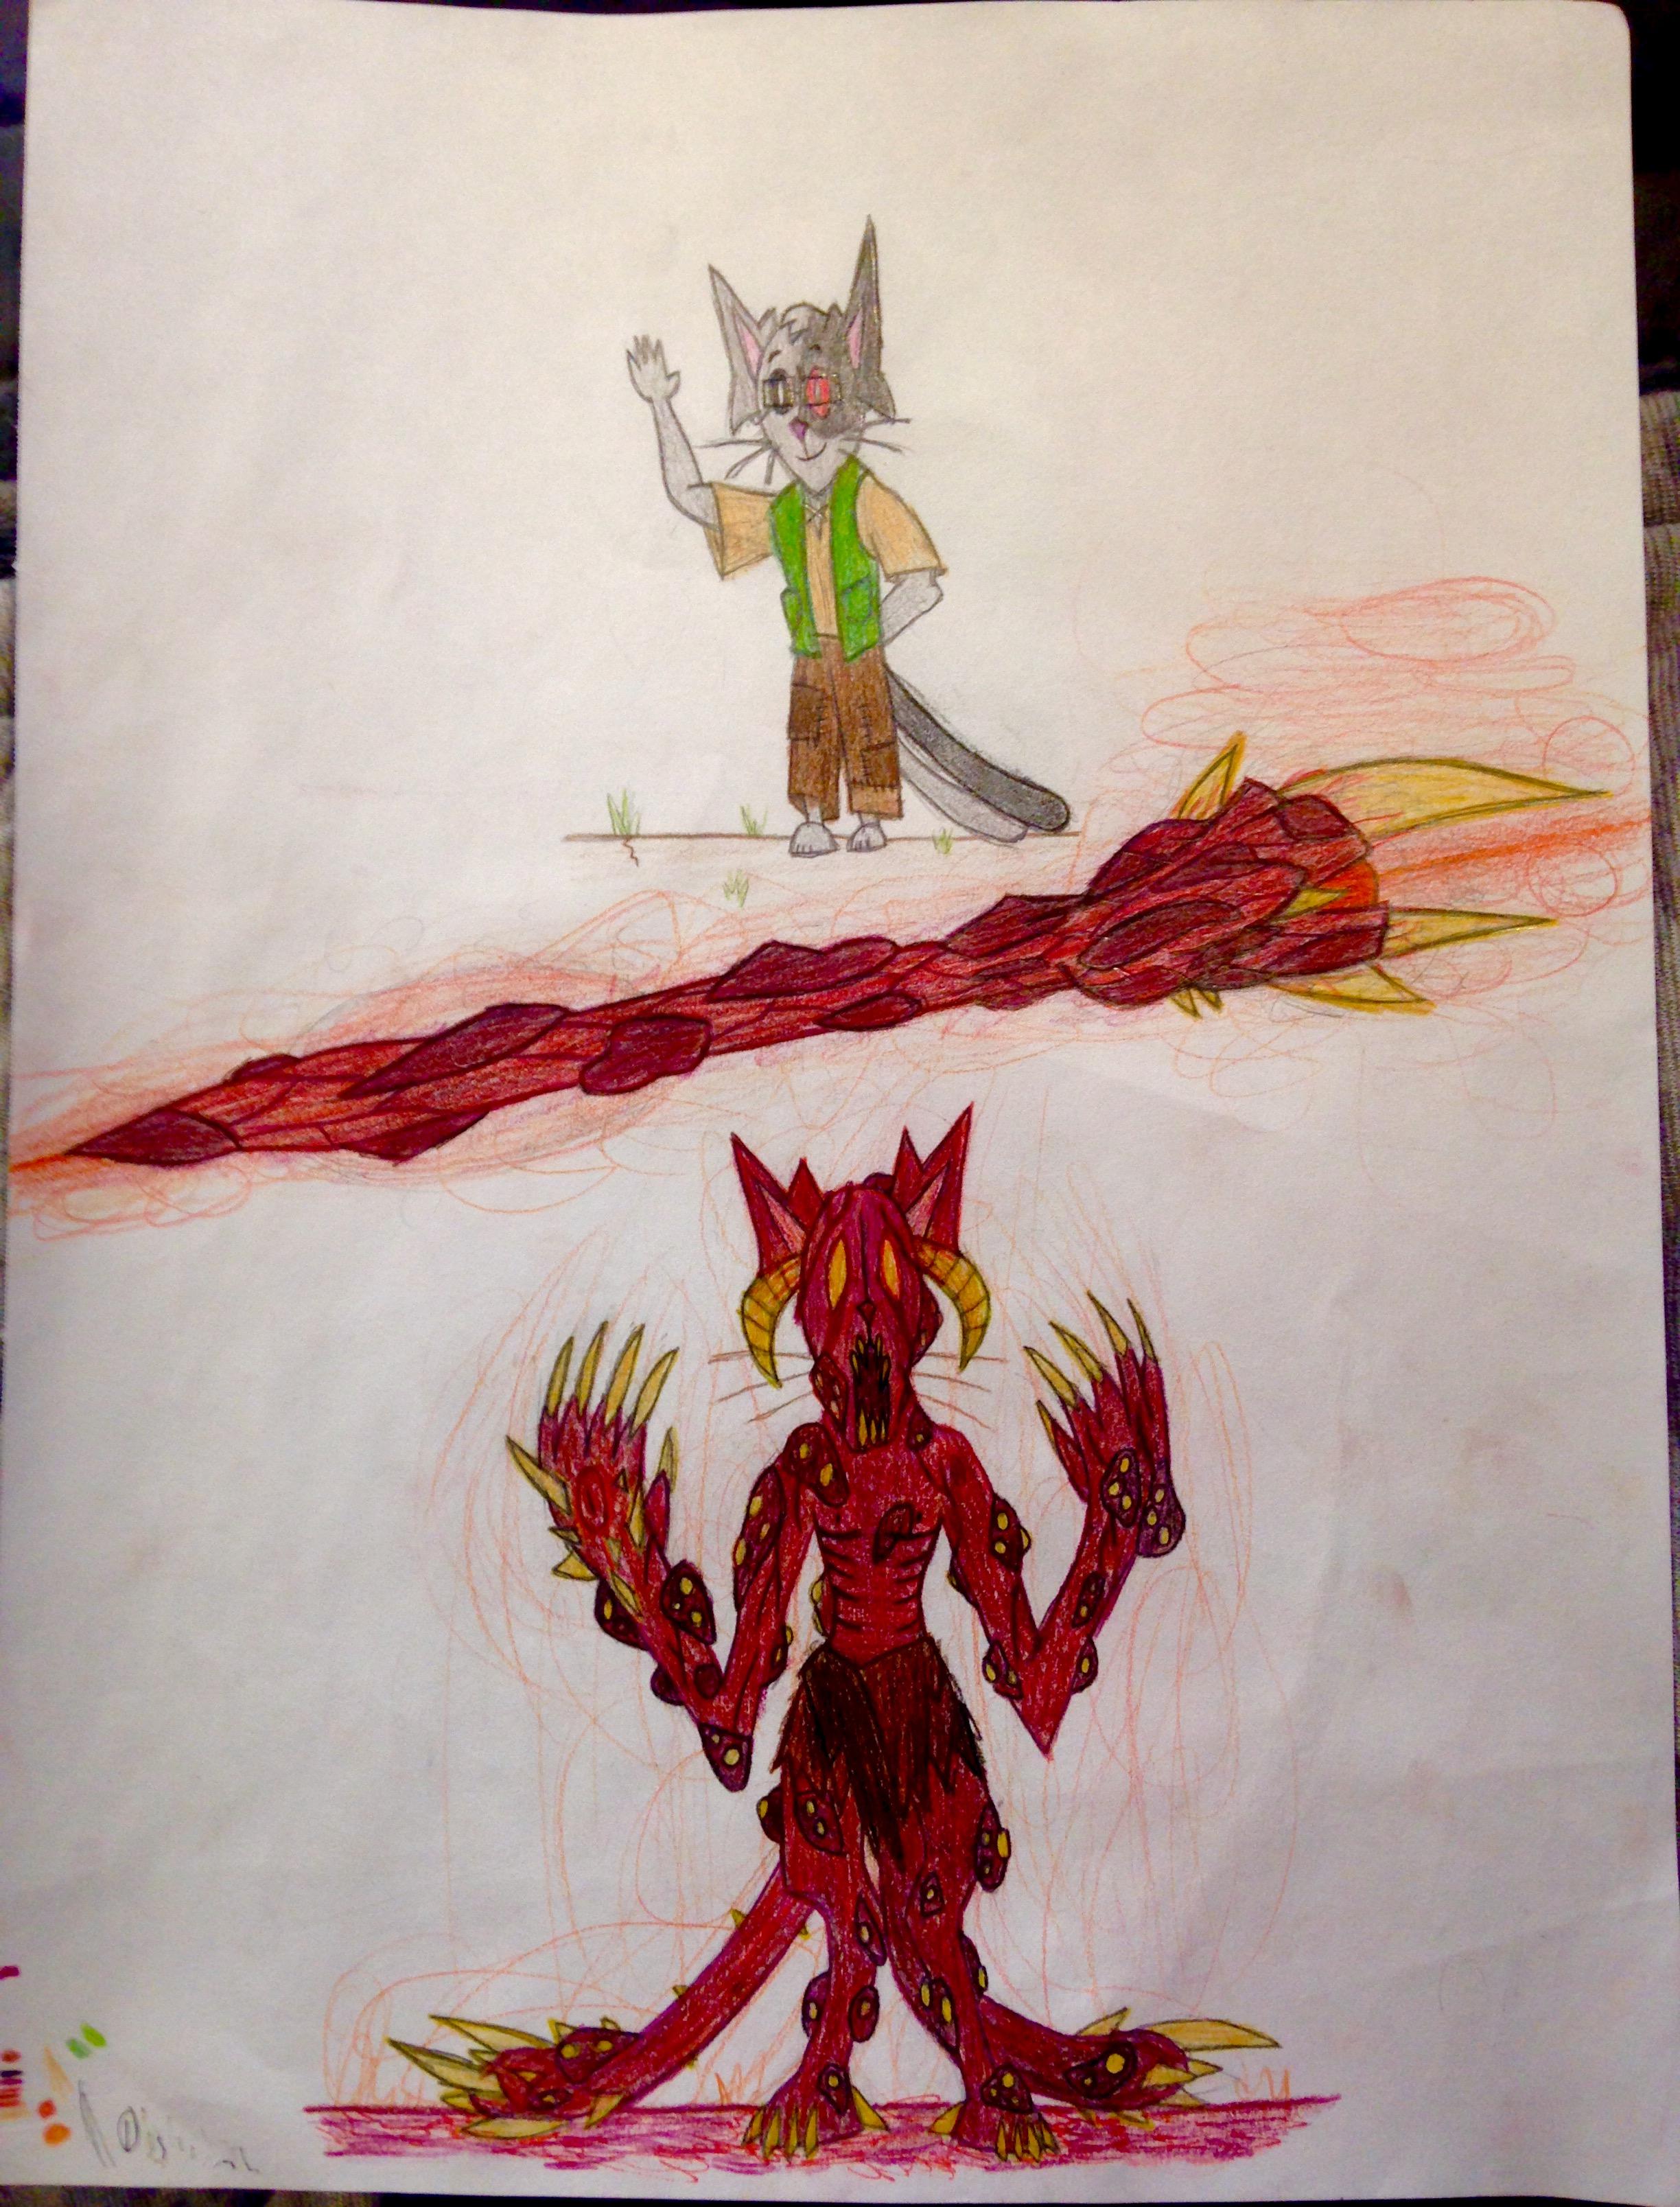 Monster by PlasmaDragonite